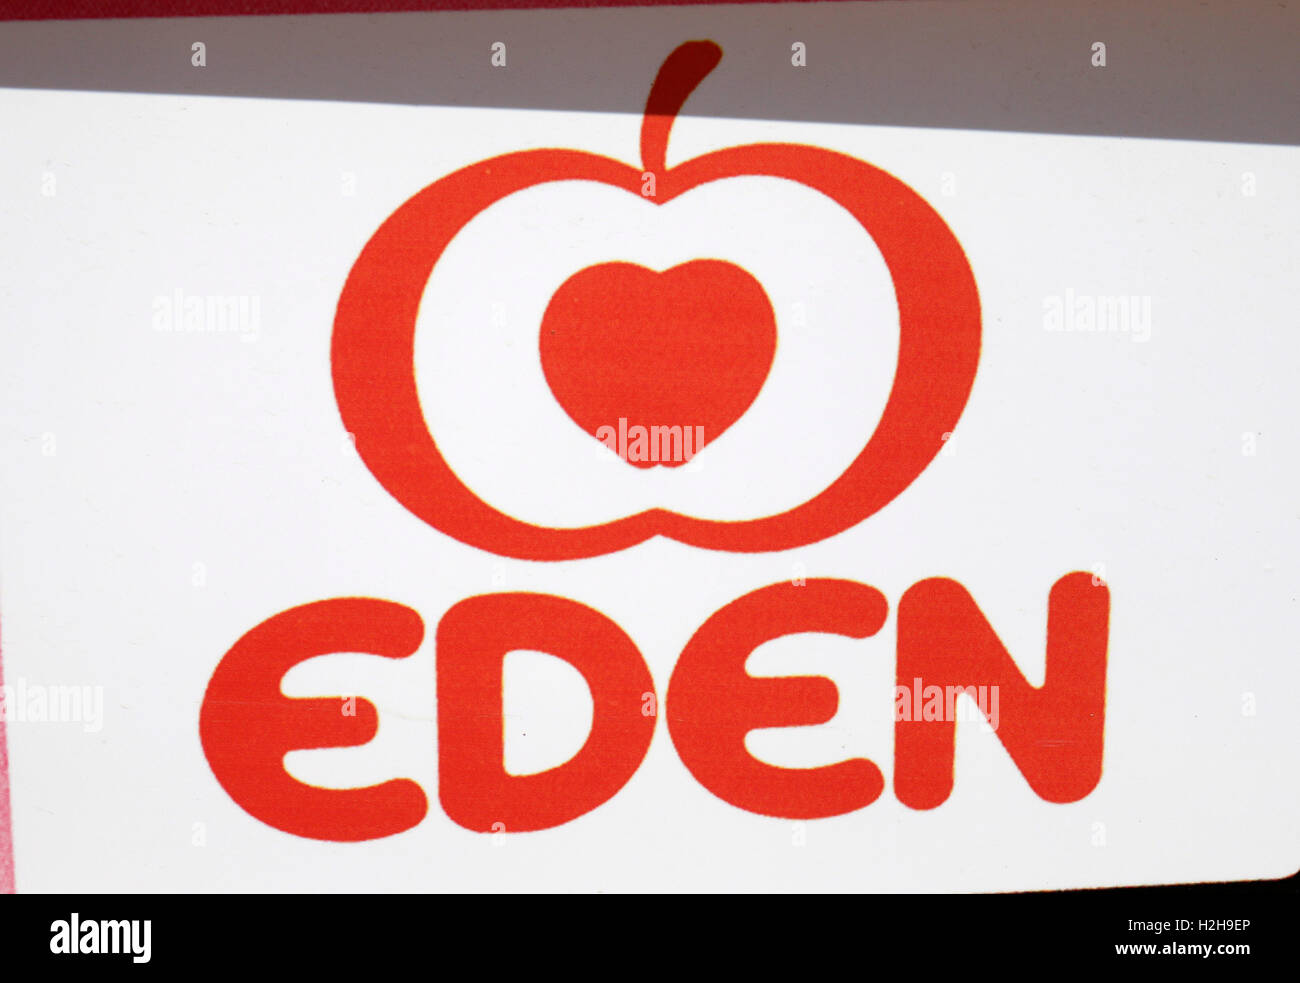 das Logo der Marke 'Eden', Ibiza, Spanien. - Stock Image